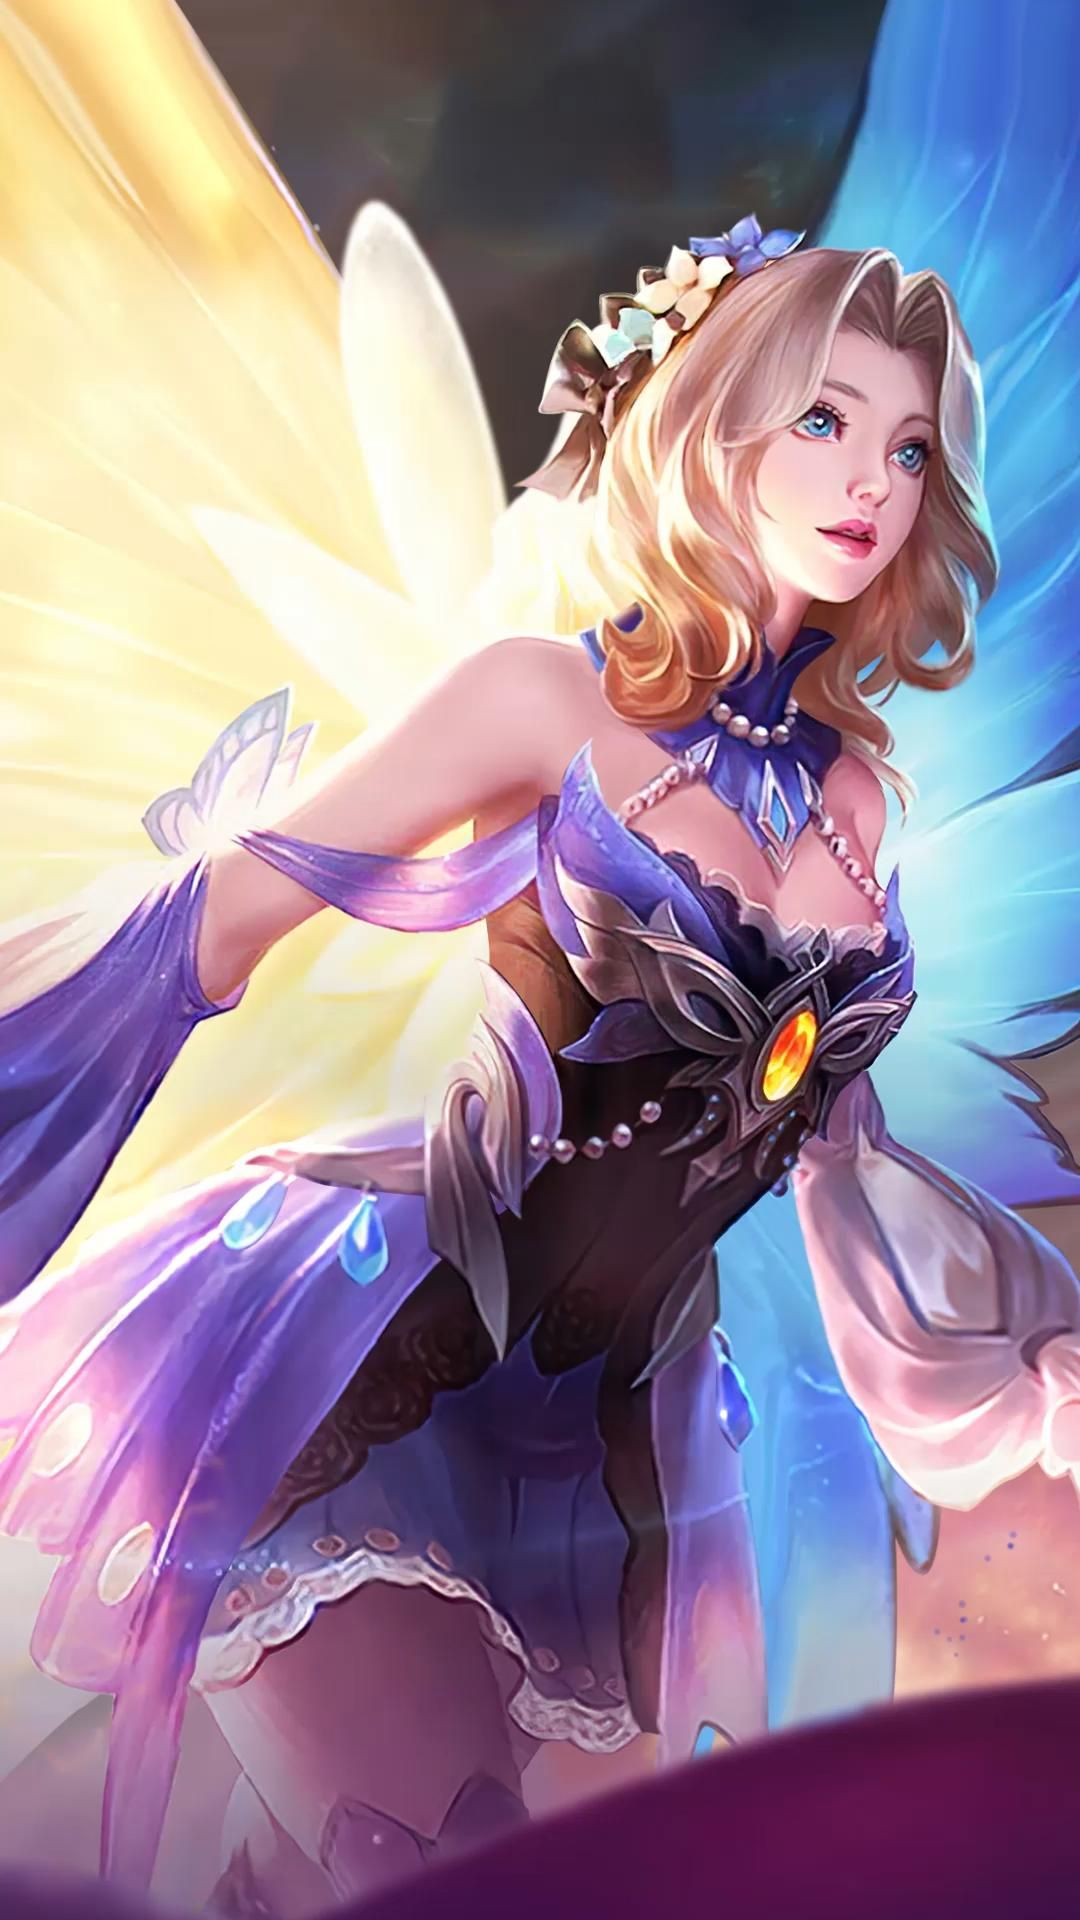 Lunox Butterfly Seraphim - Mobile Legends [ Live Wallpaper